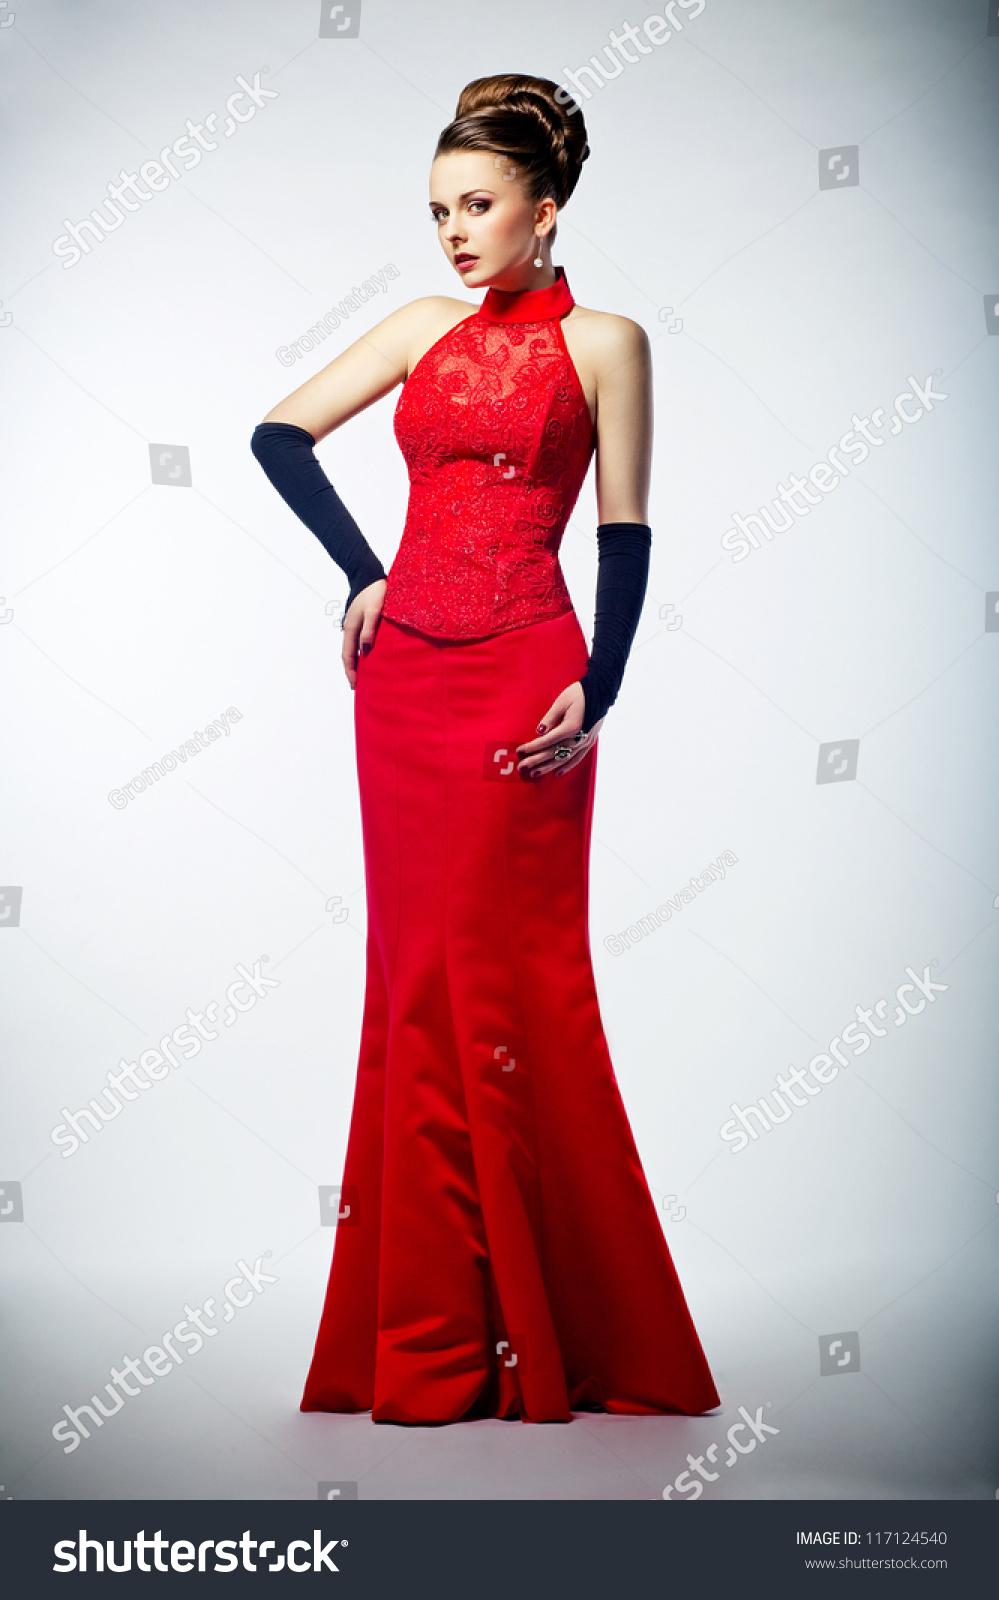 Beauty Bride Long Bridal Red Dress Stock Photo 117124540 ...